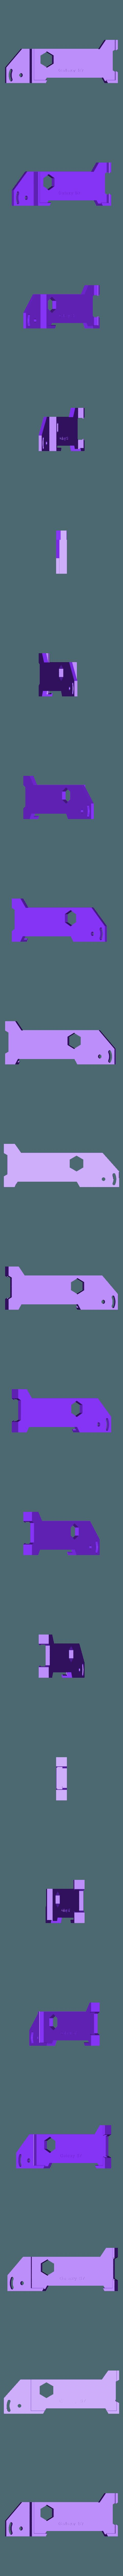 Support smartphone galaxy s7 nu - HORIZONTALE.STL Download free STL file Support smartphone peugeot 208-308 • 3D print design, C1-concept